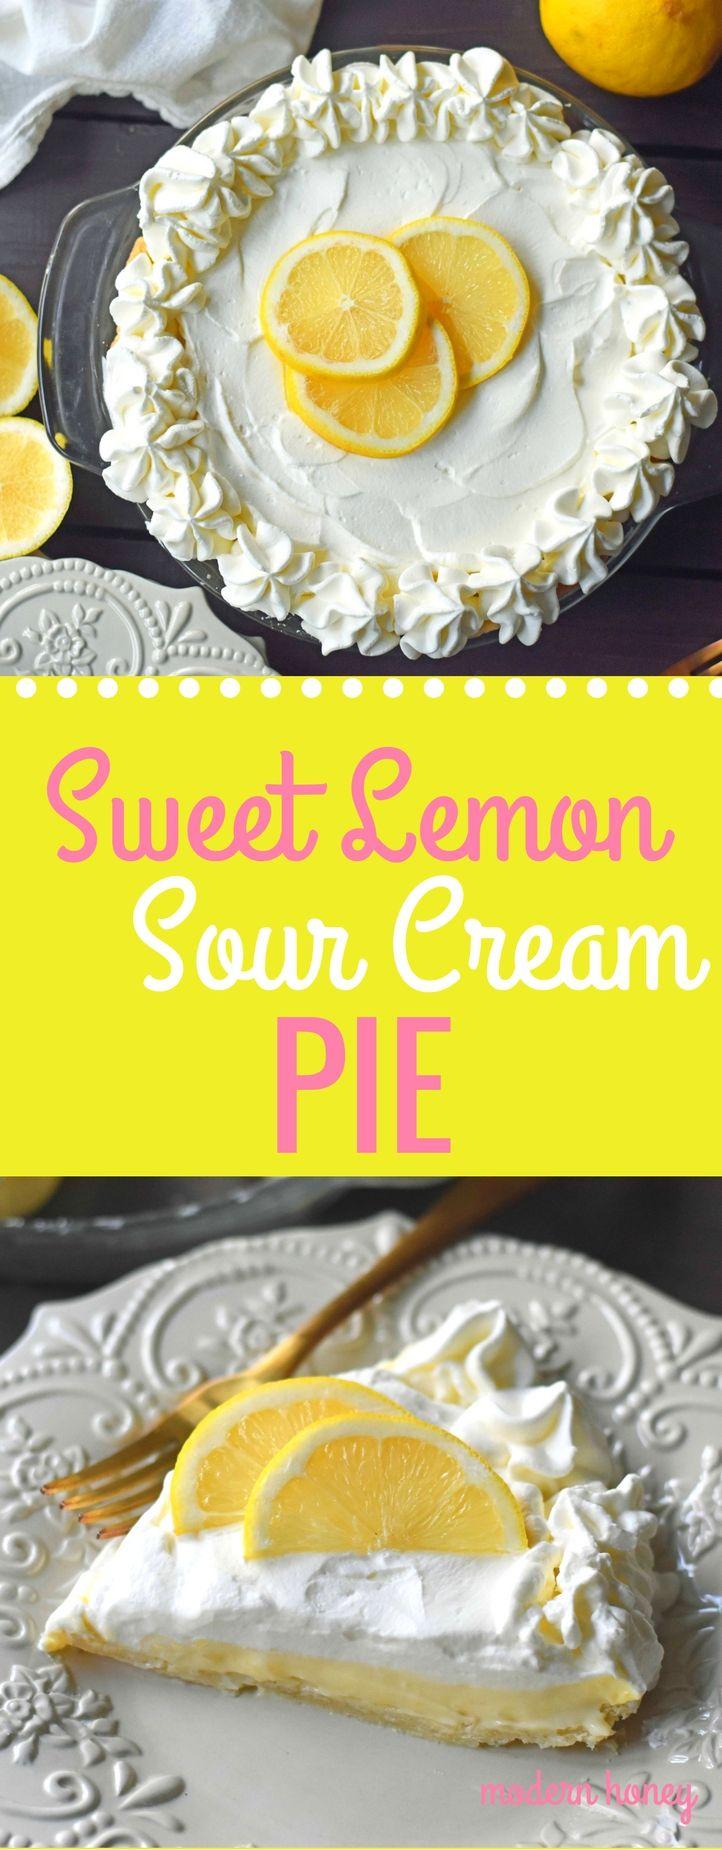 Sweet Lemon Sour Cream Pie Made With Freshly Squeezed Lemon Juice Sugar Eggs And Sour Cream To Make It Lemon Sour Cream Pie Yummy Food Dessert Lemon Recipes